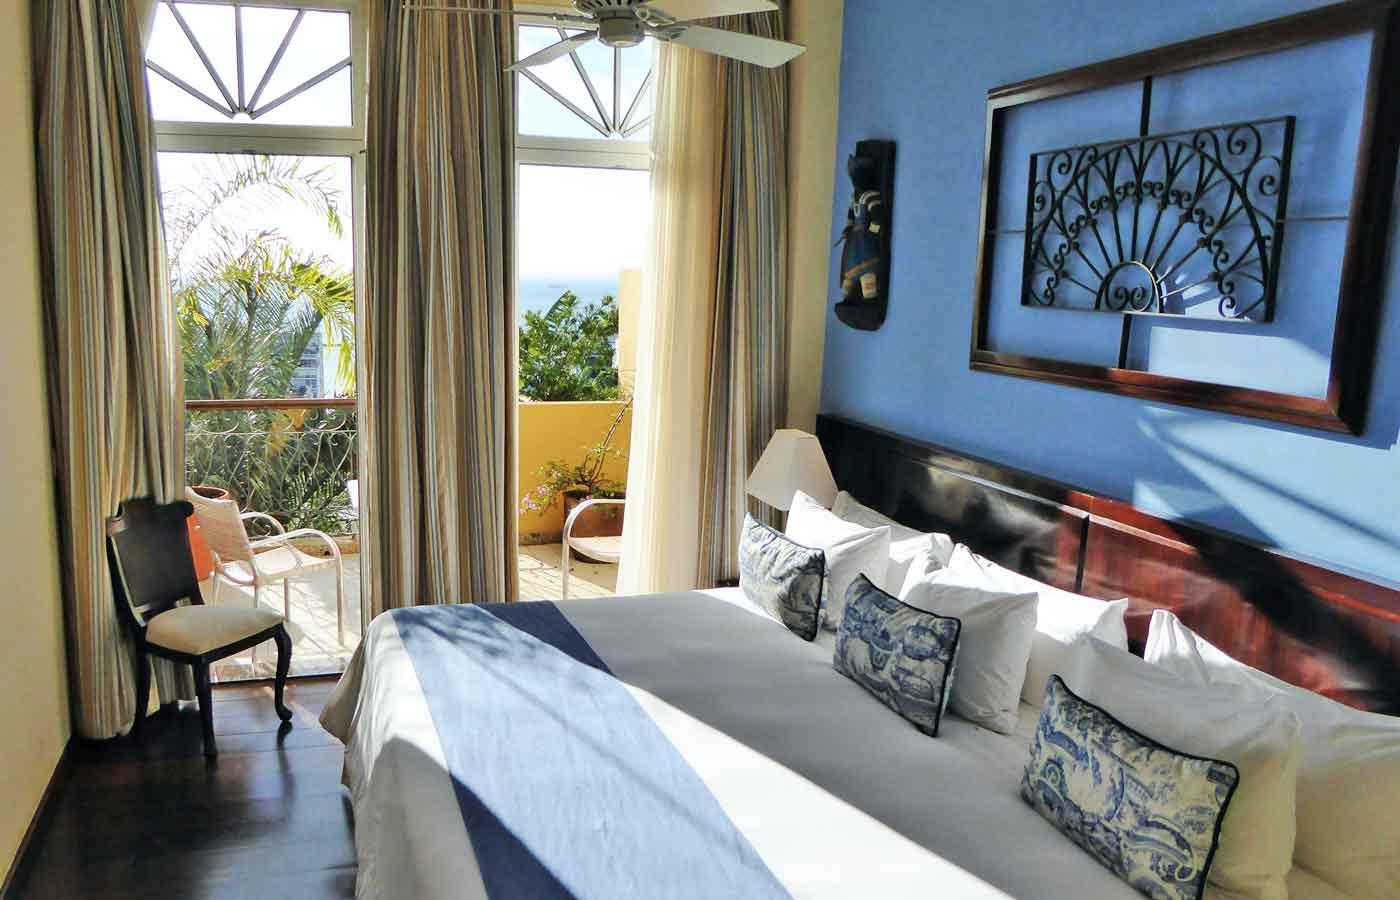 Casa Amarelindo - Luxury holidays to Salvador, Brazil